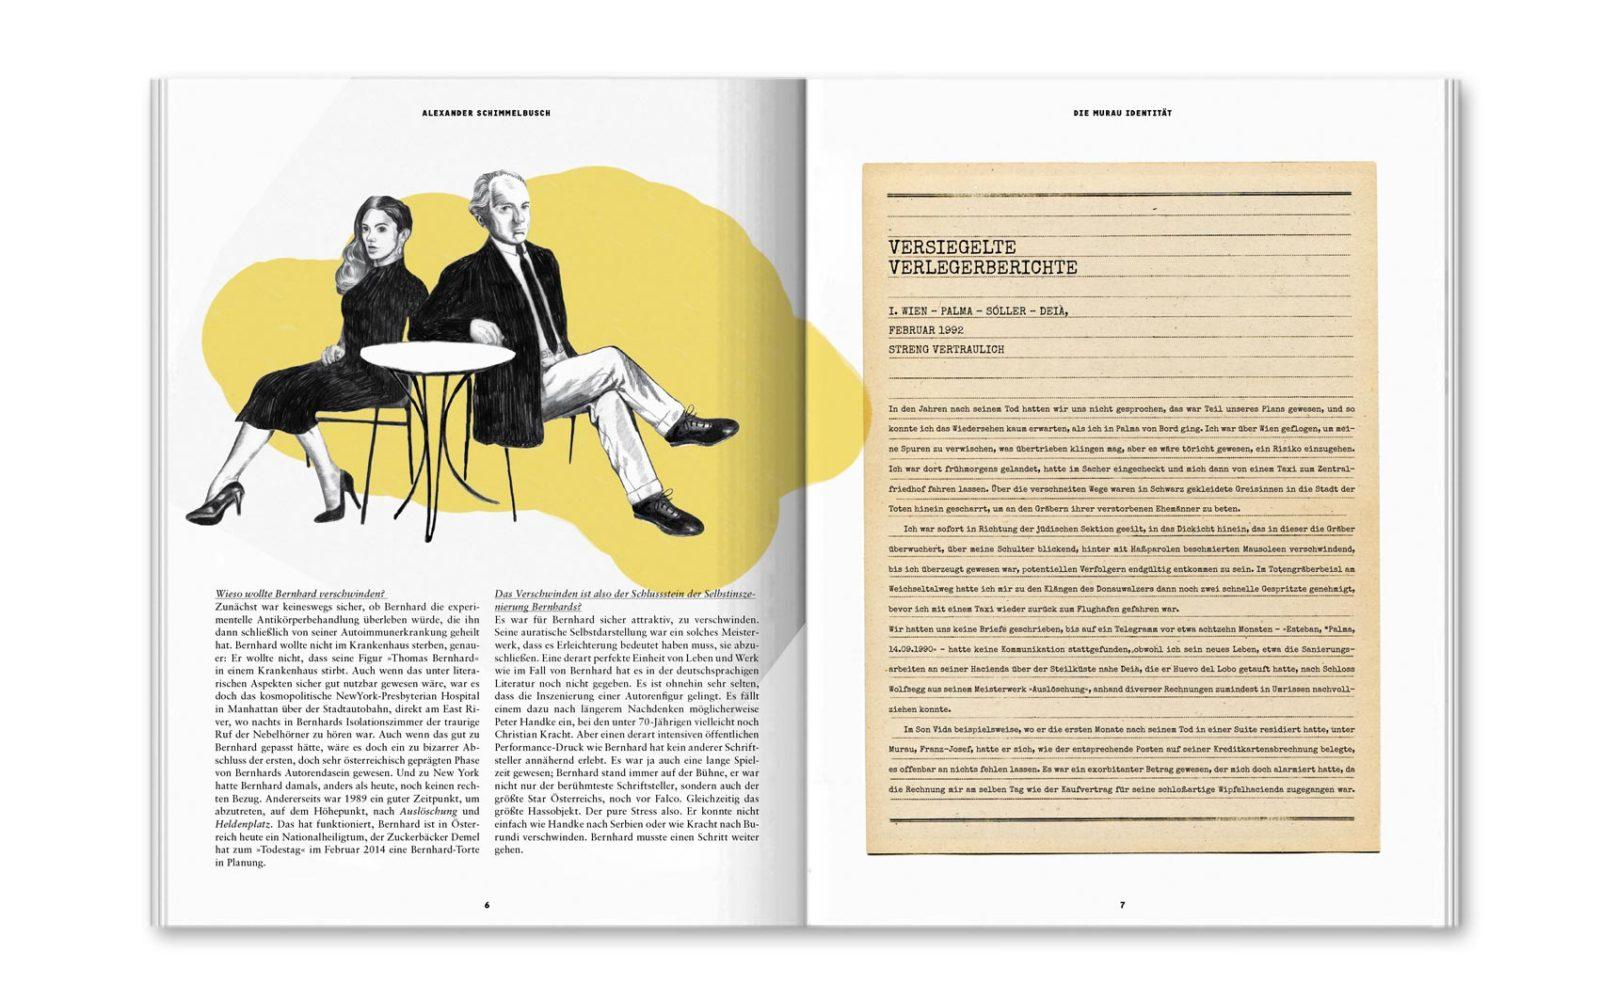 Editienne Grafikdesign - Kommunikationsdesign Berlin- Editorial Design Verlagskommunikation 23